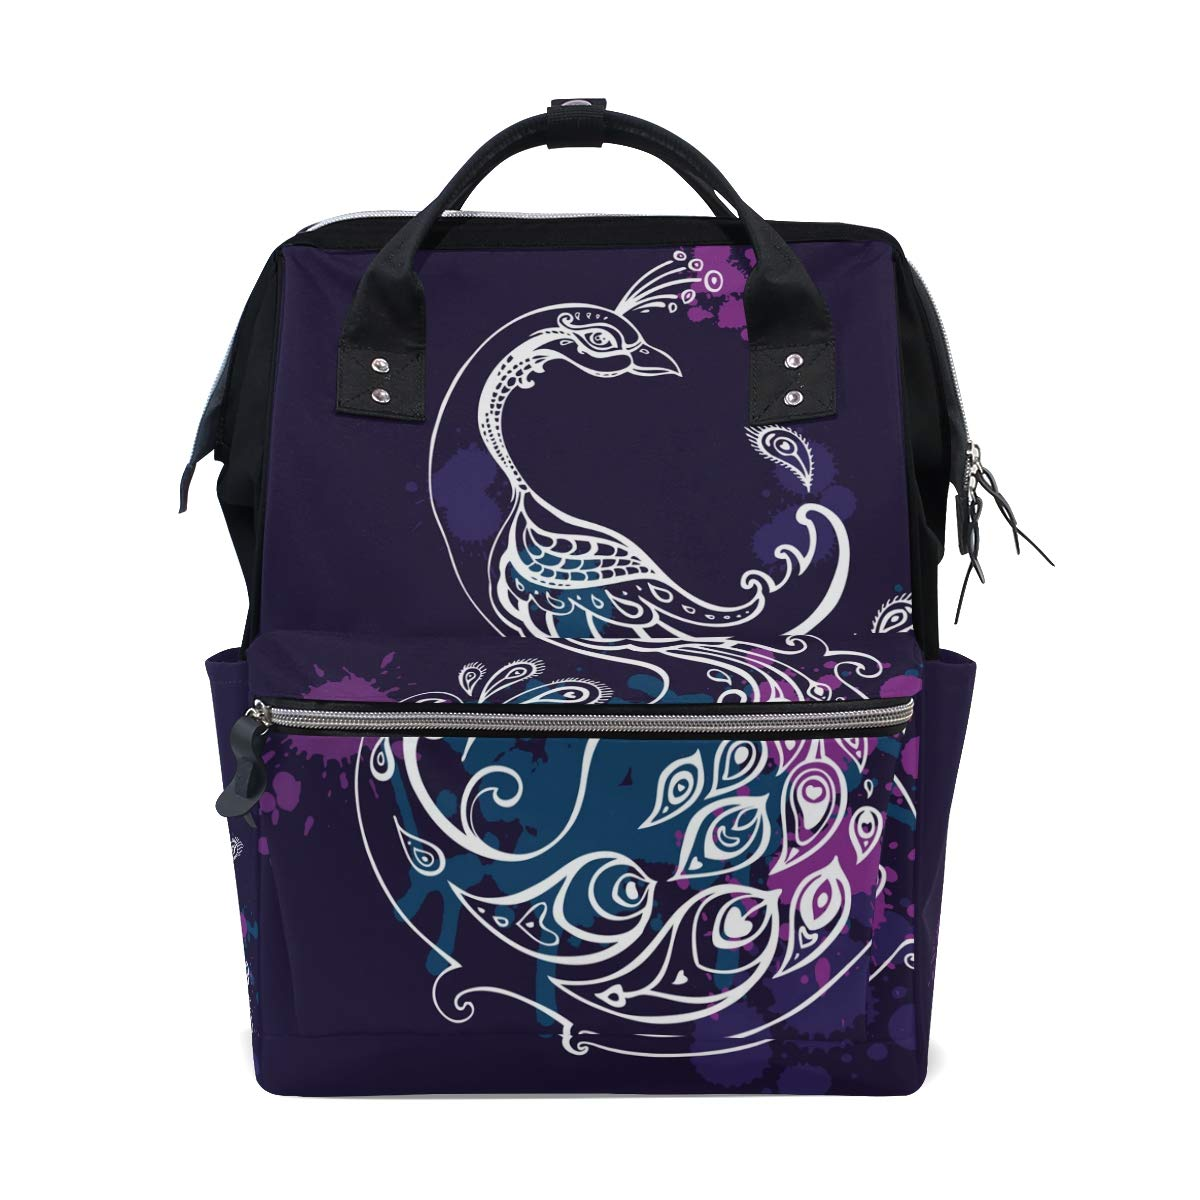 MERRYSUGAR Diaper Bag Backpack Peacock Feather Purple Multifunction Travel Bag